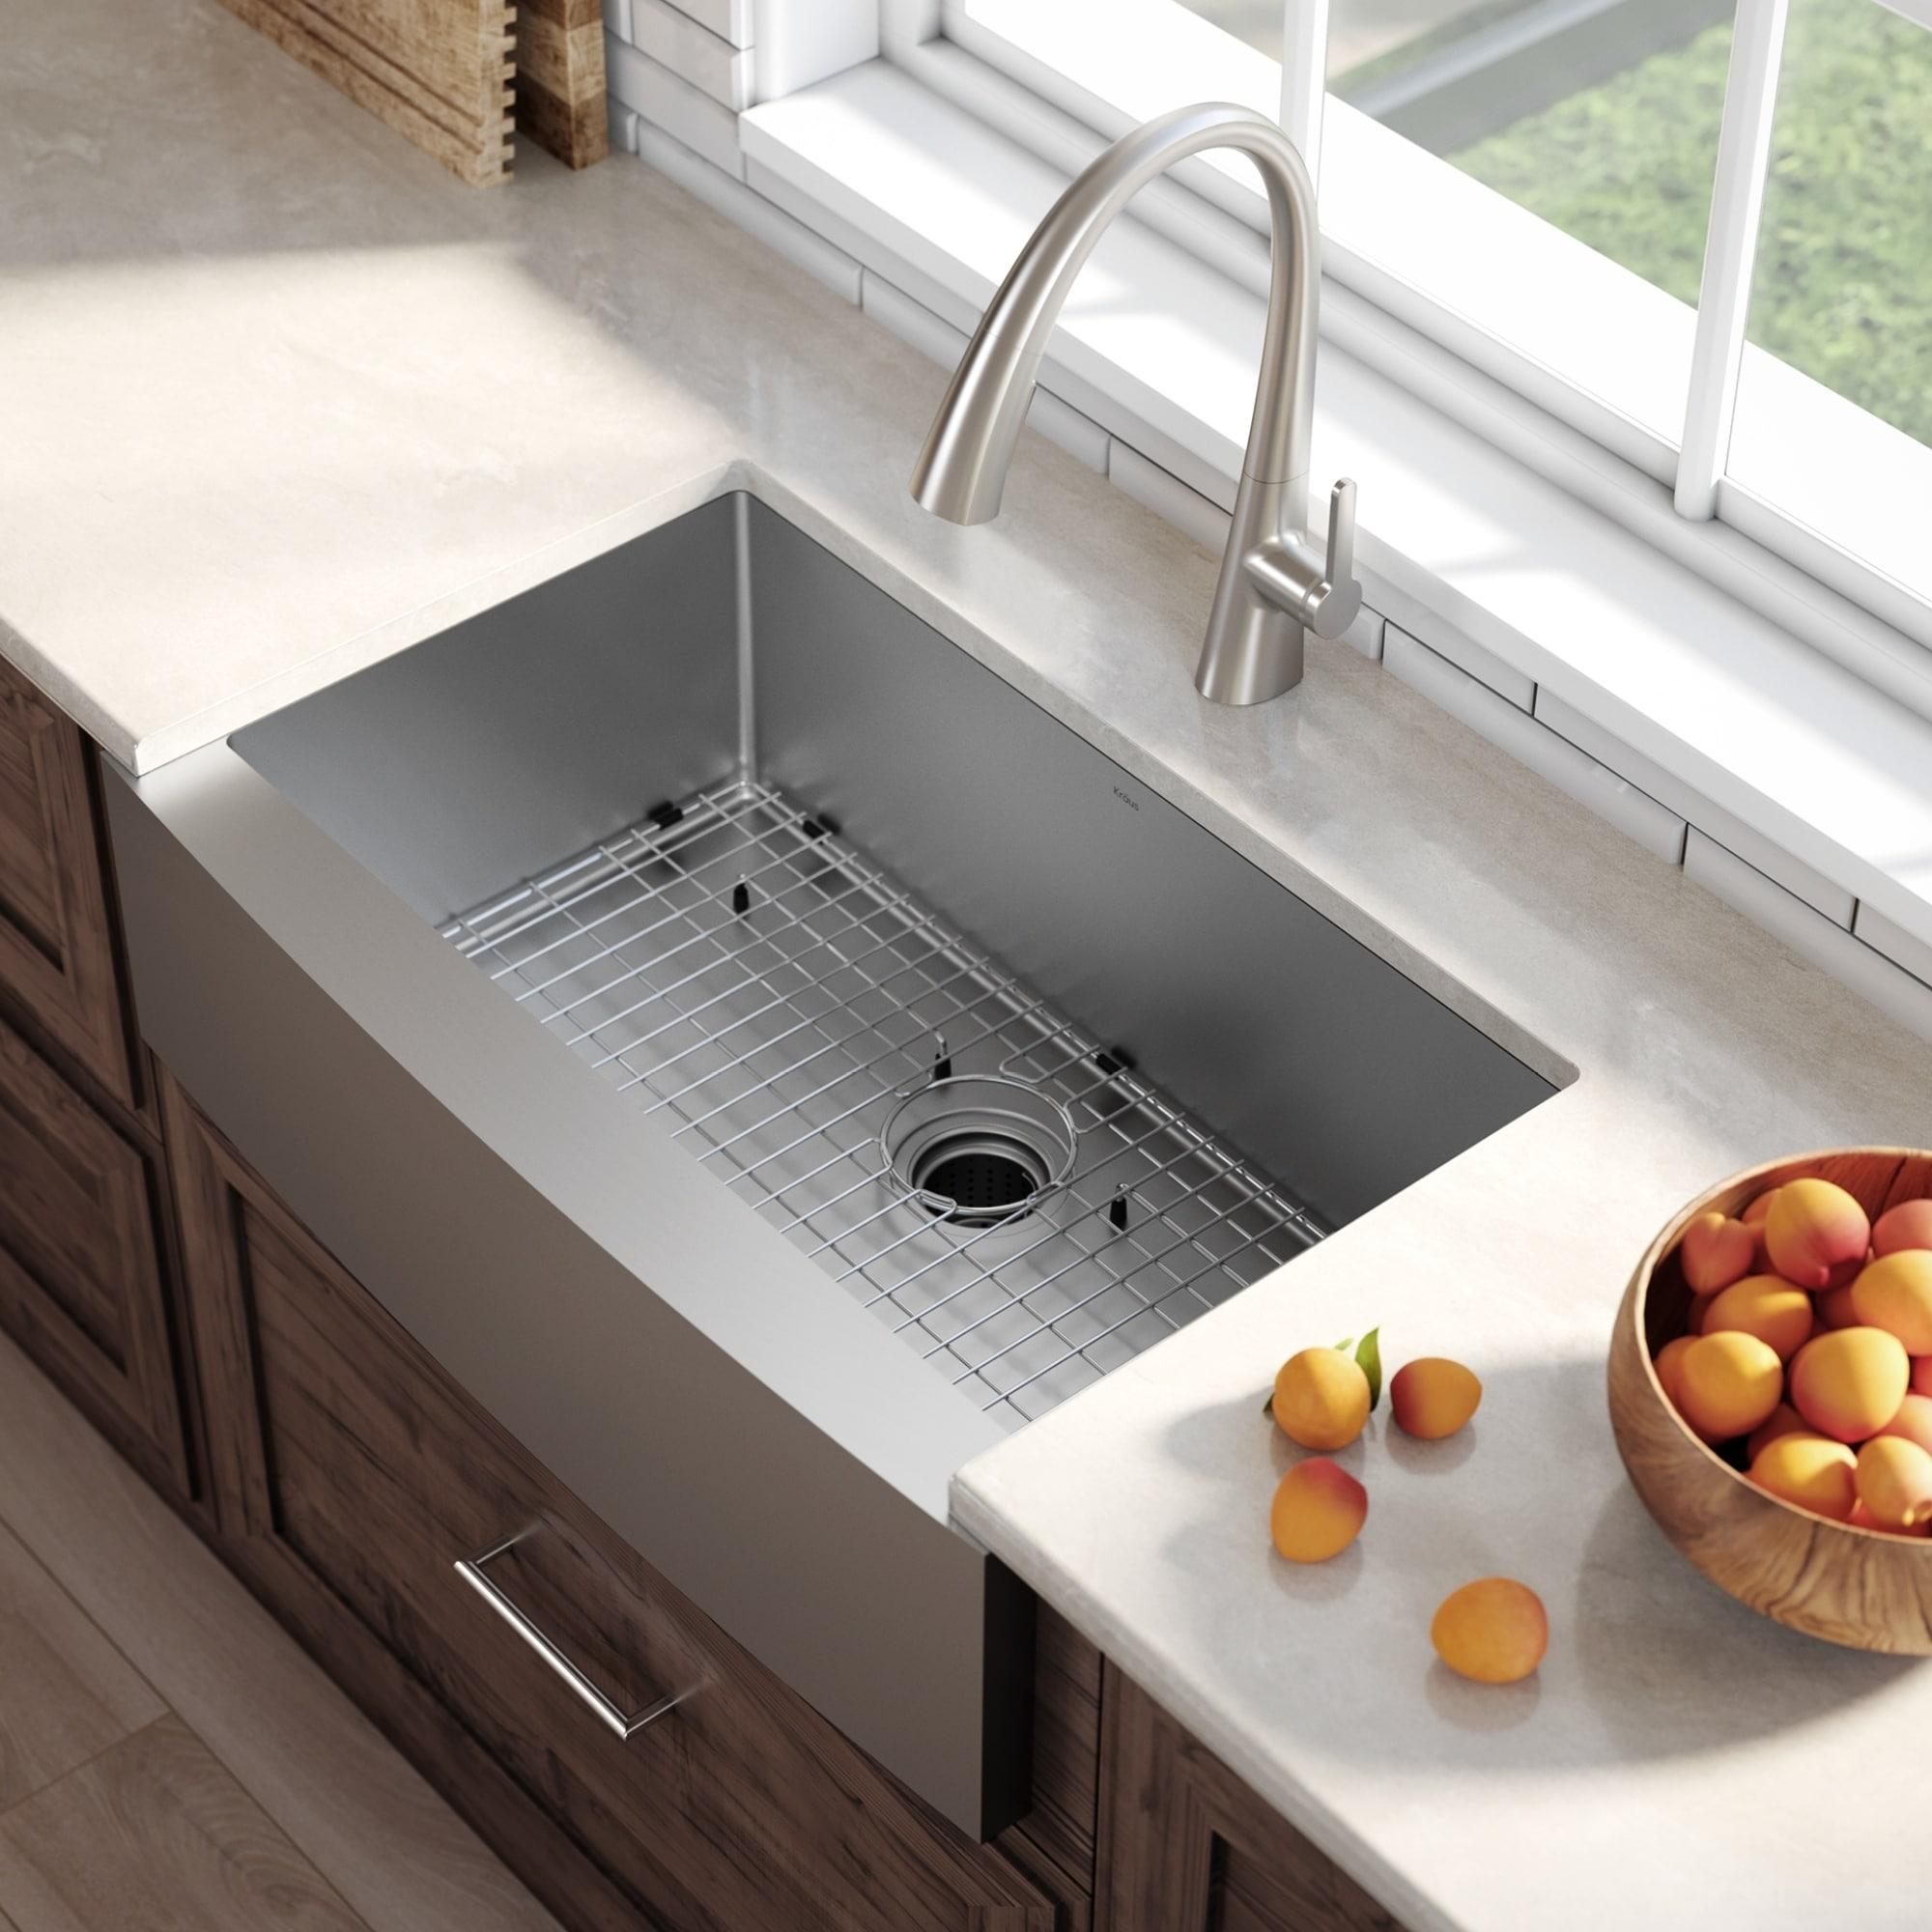 Kraus KHF200-30 Farmhouse 30 inch 1-Bowl Stainless Steel Kitchen Sink